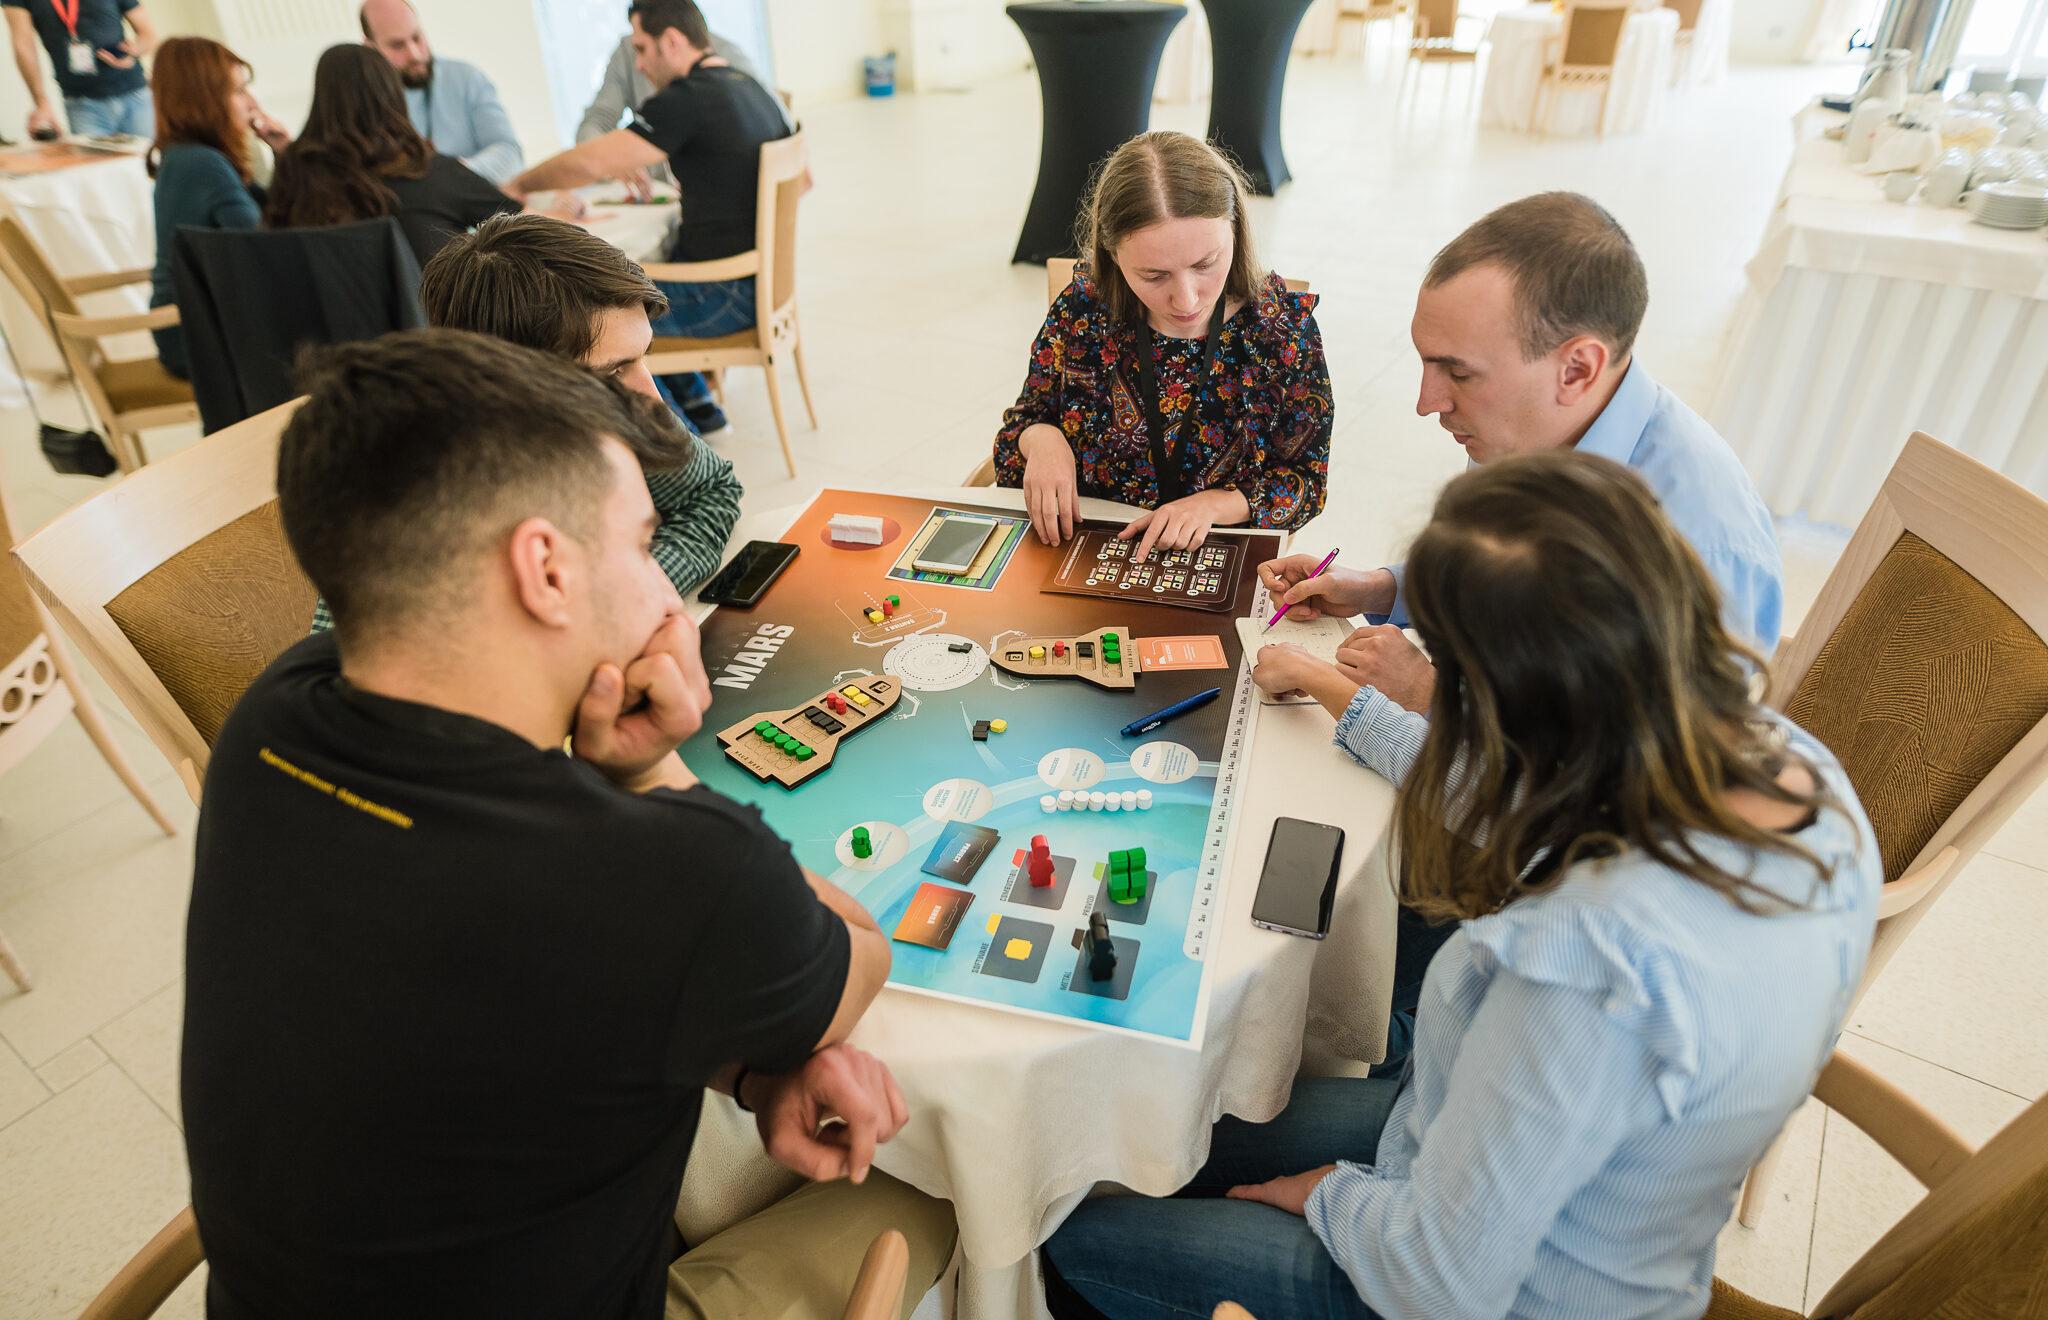 Cooperation Team Building Game